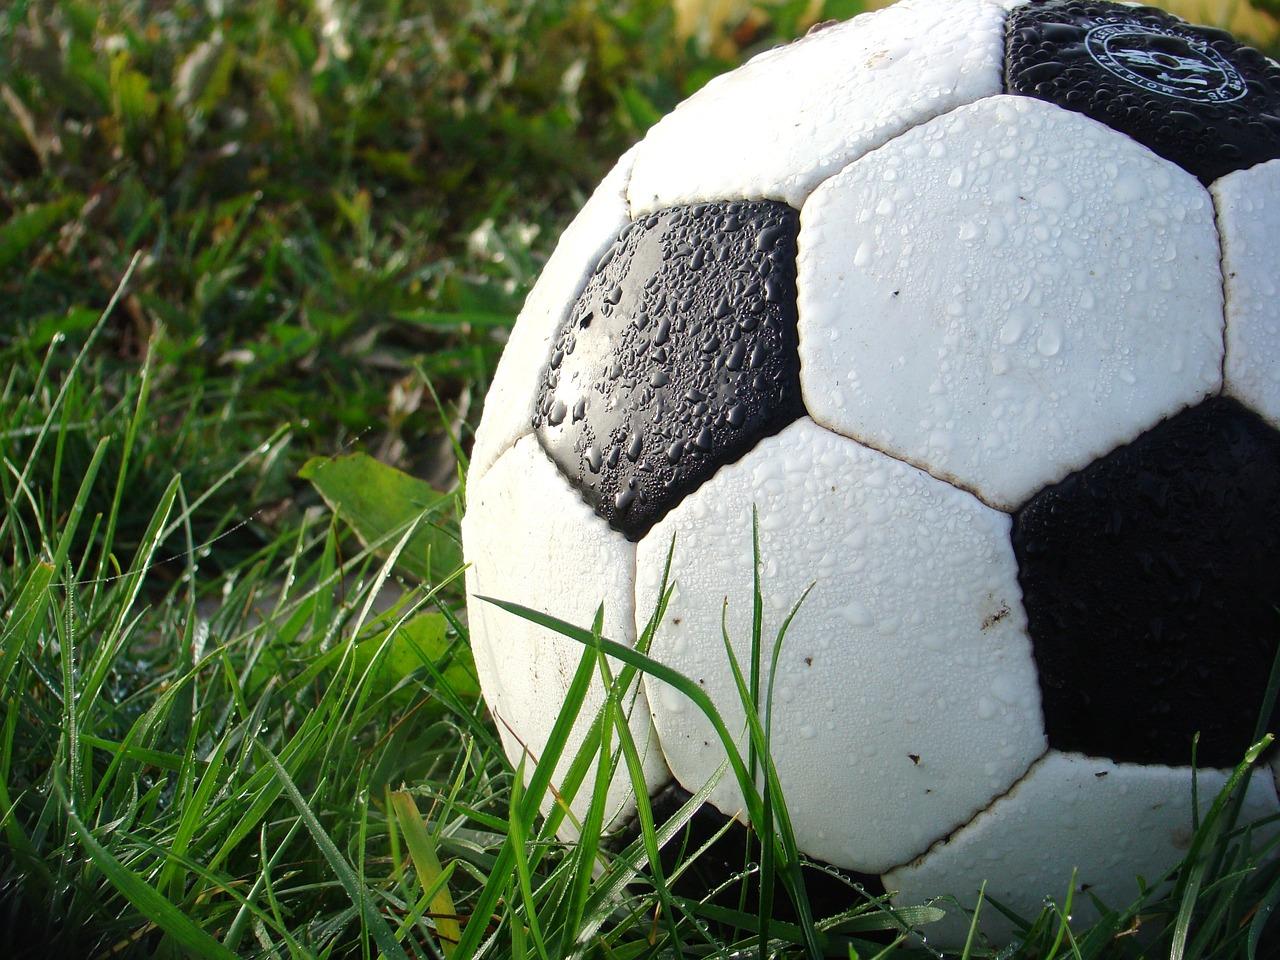 US Women's soccer team sues for gender discrimination